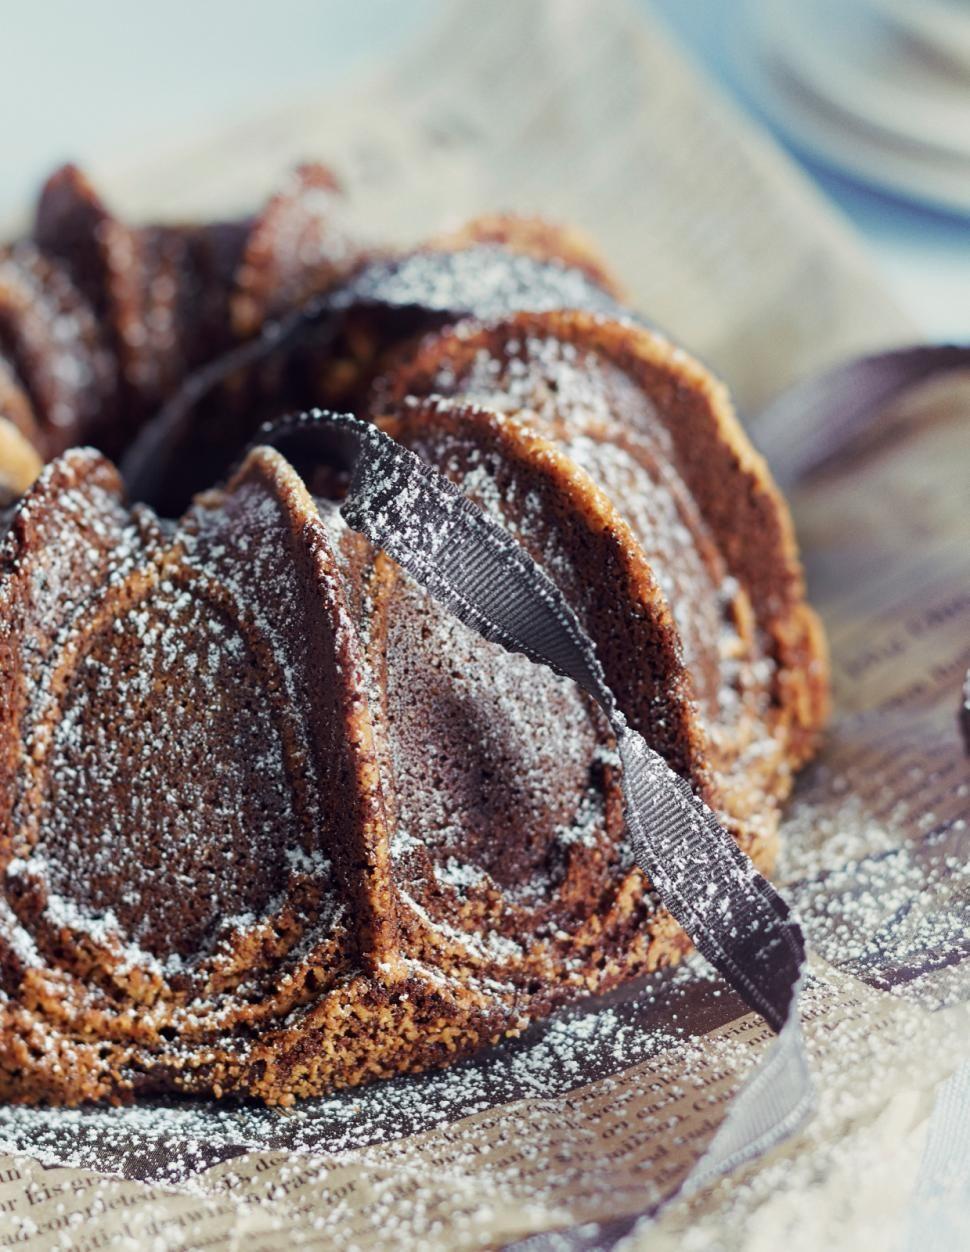 Gluteeniton taatelikakku // Gluten free Date Cake Food & Style Elina Jyväs Photo Riikka Kantinkoski Maku 7/2015, www.maku.fi